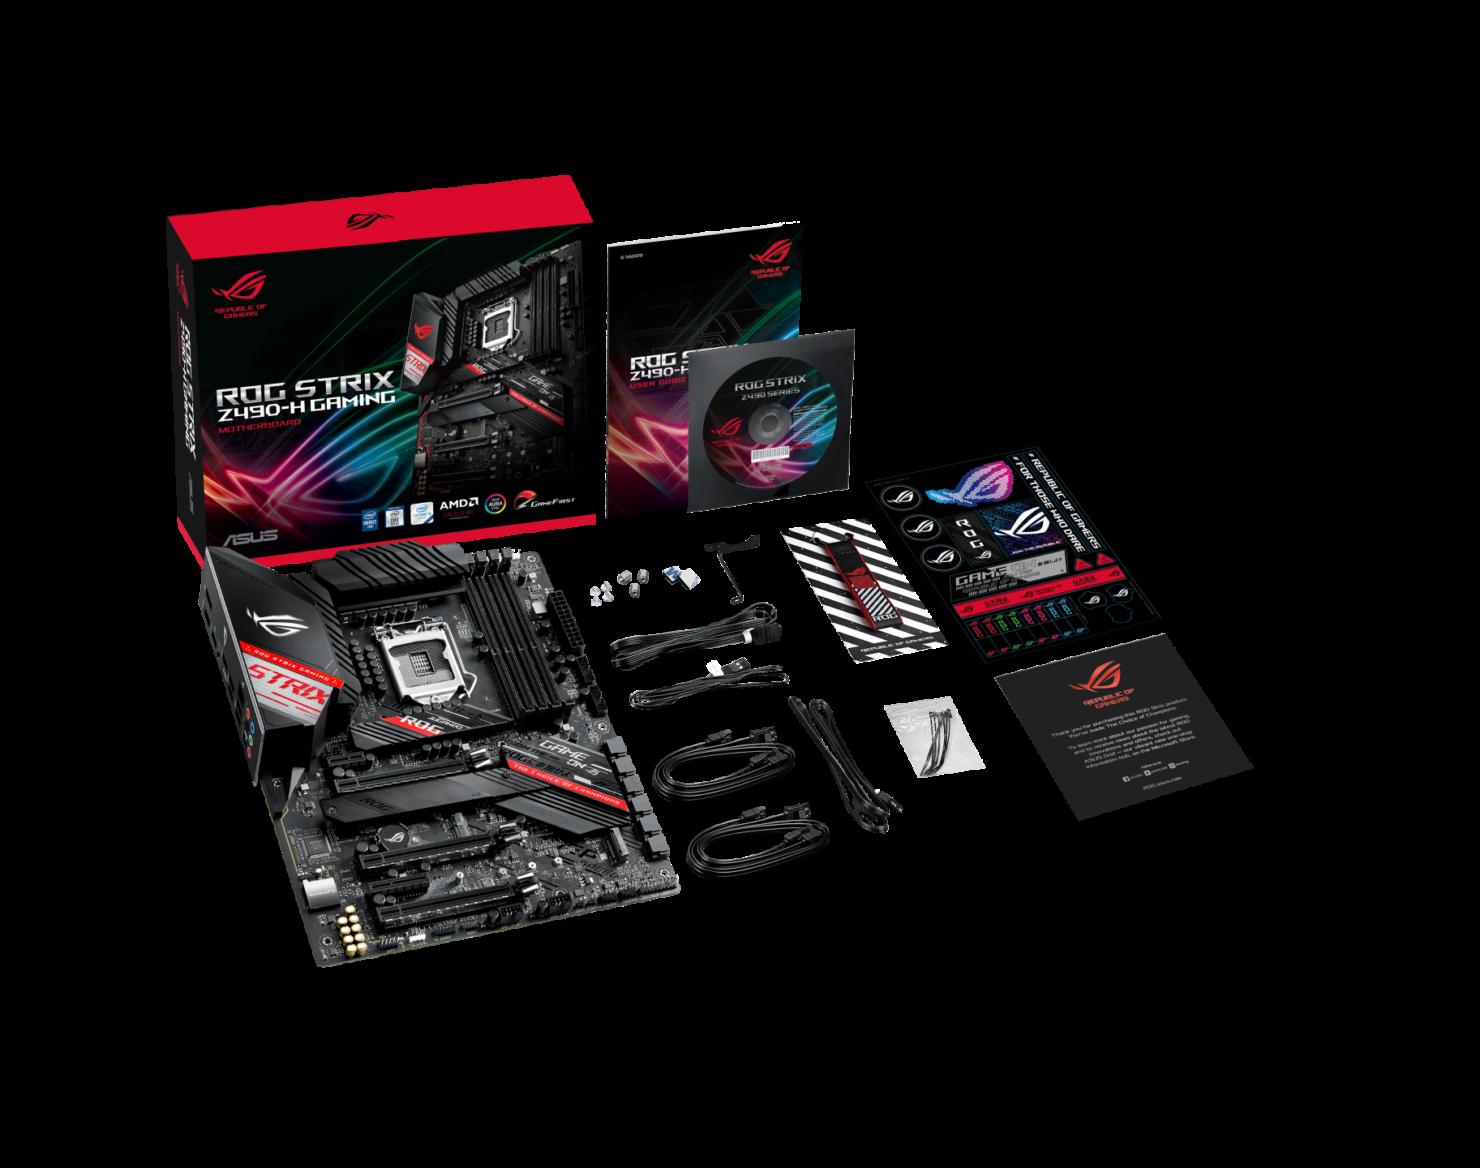 rog-strix-z490-h-whats-inside-the-box-custom